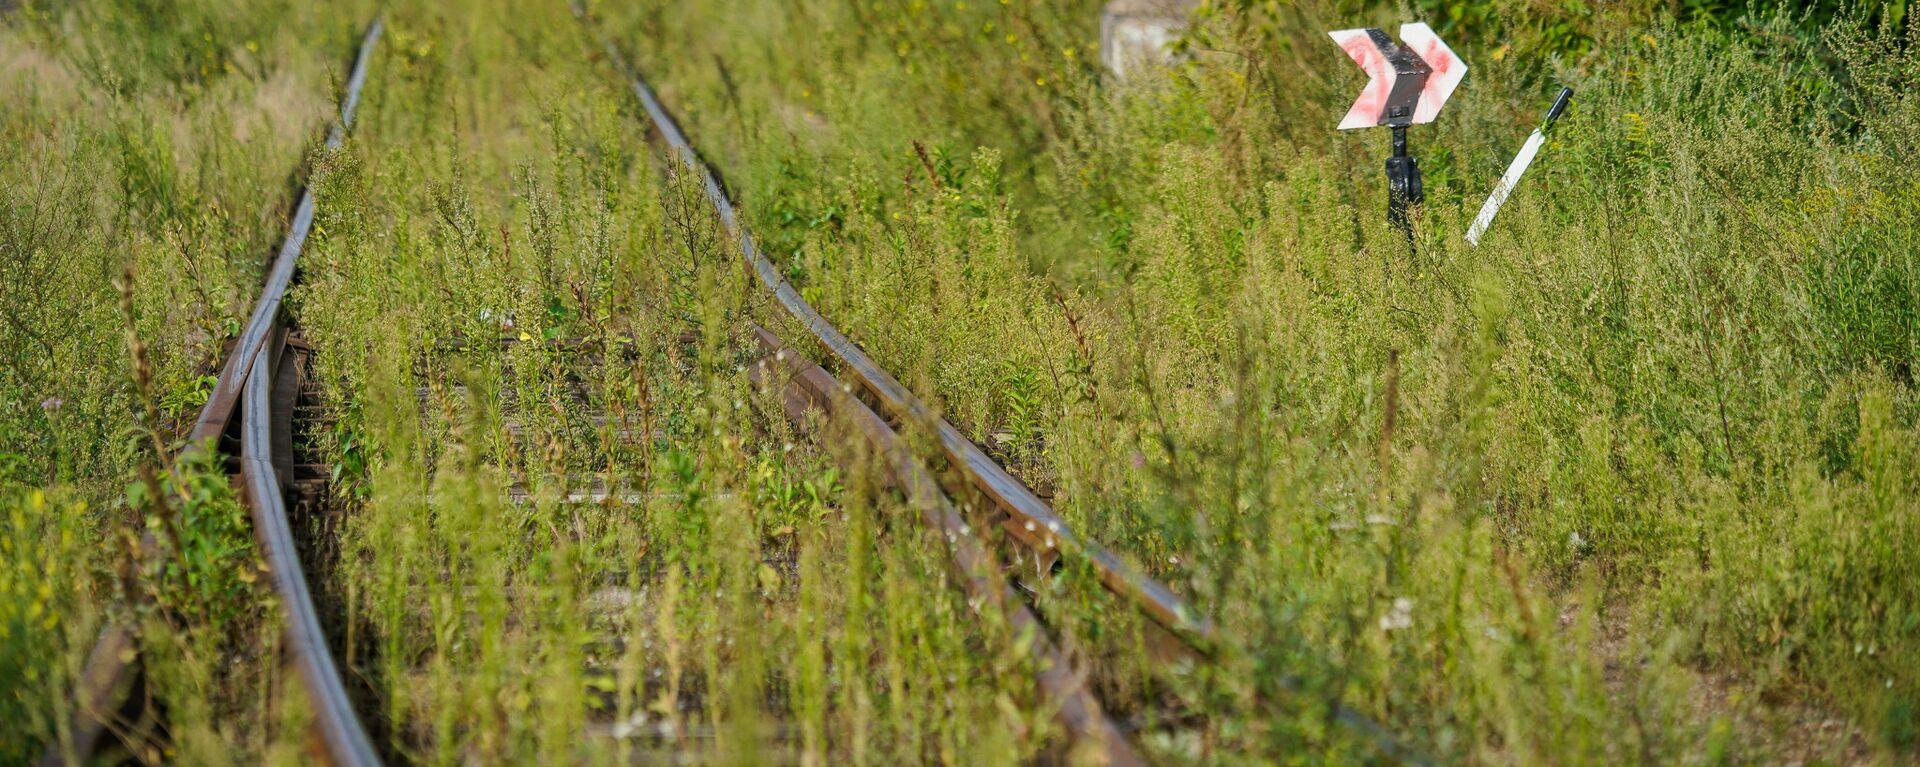 Железная дорога - Sputnik Latvija, 1920, 27.07.2021